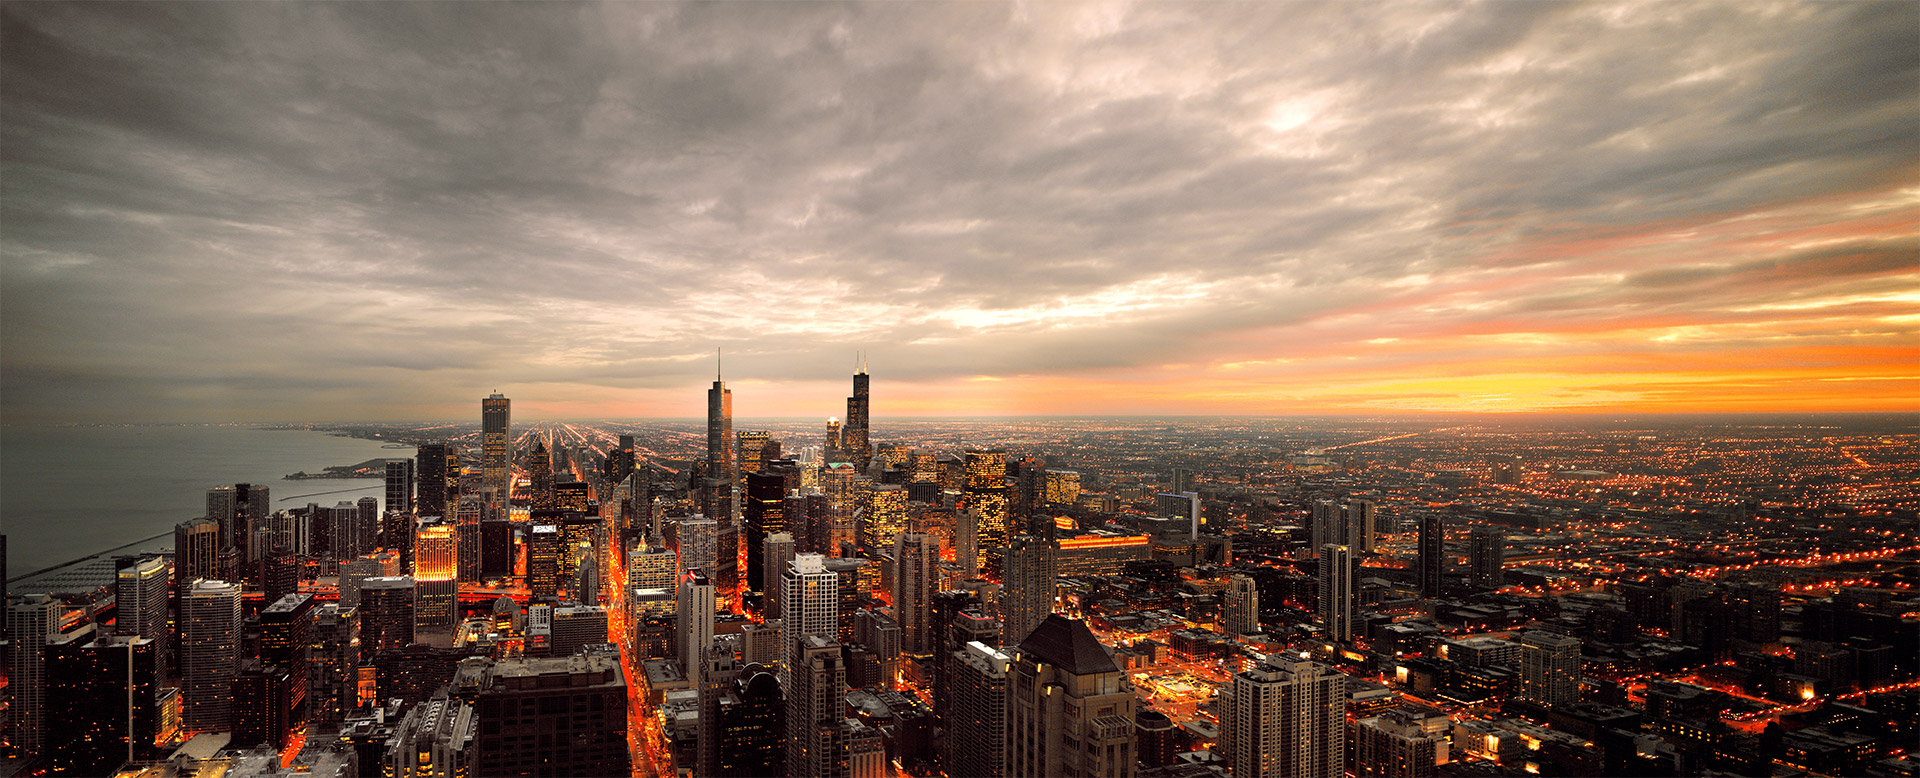 Chicago_Panorama_evening_2